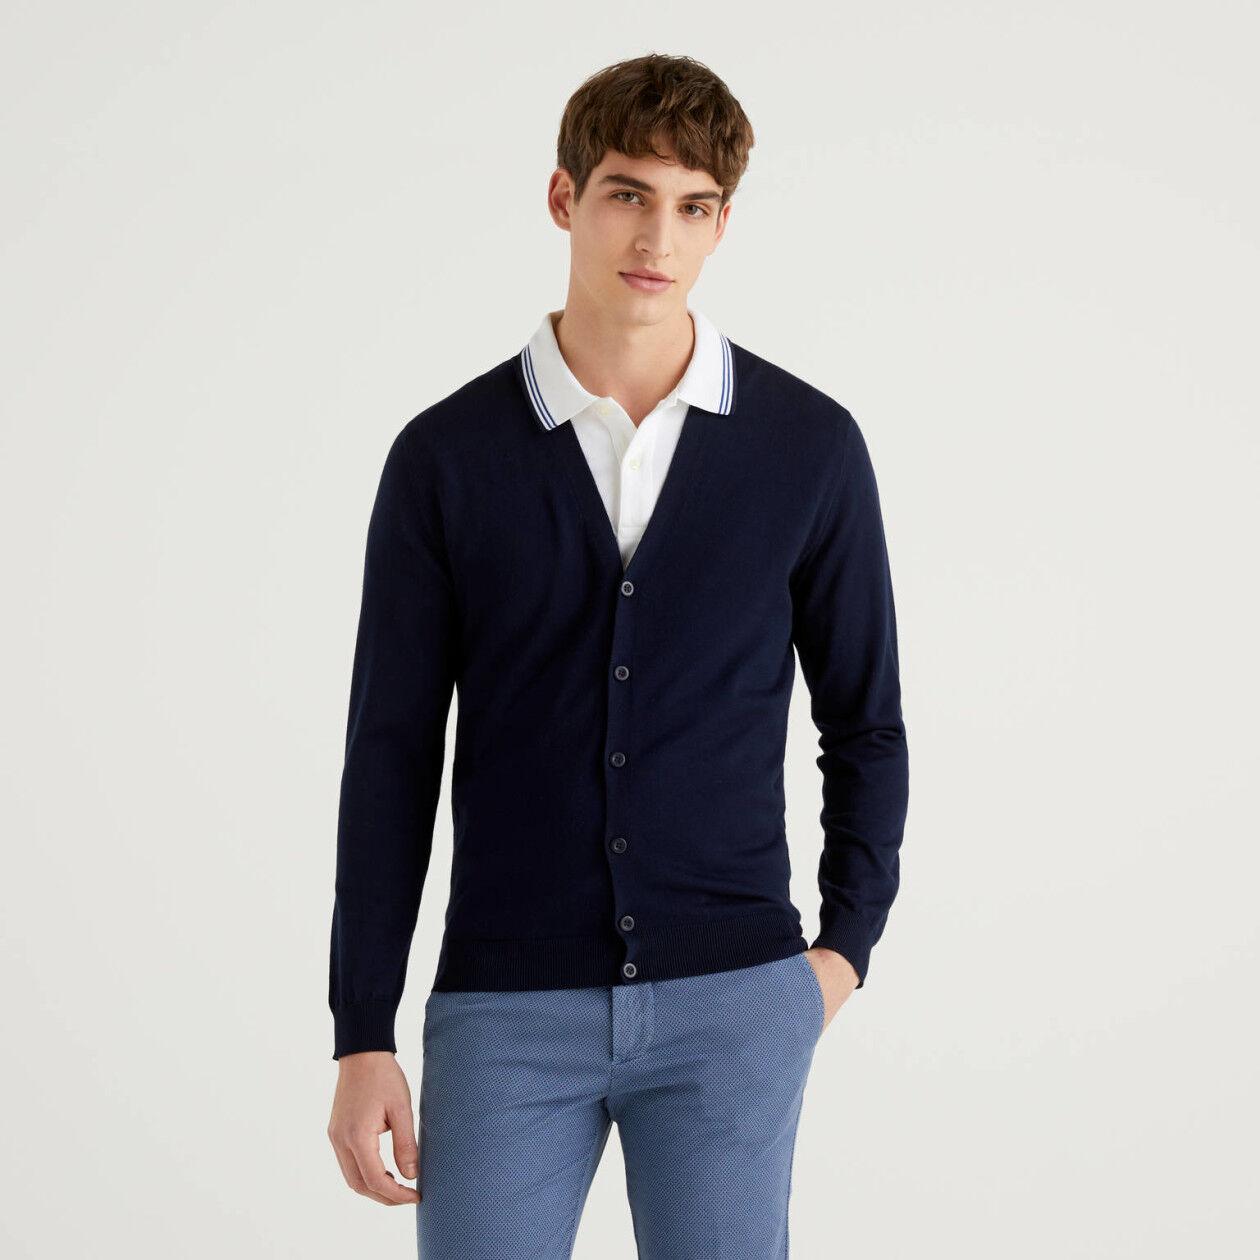 100% cotton V-neck cardigan